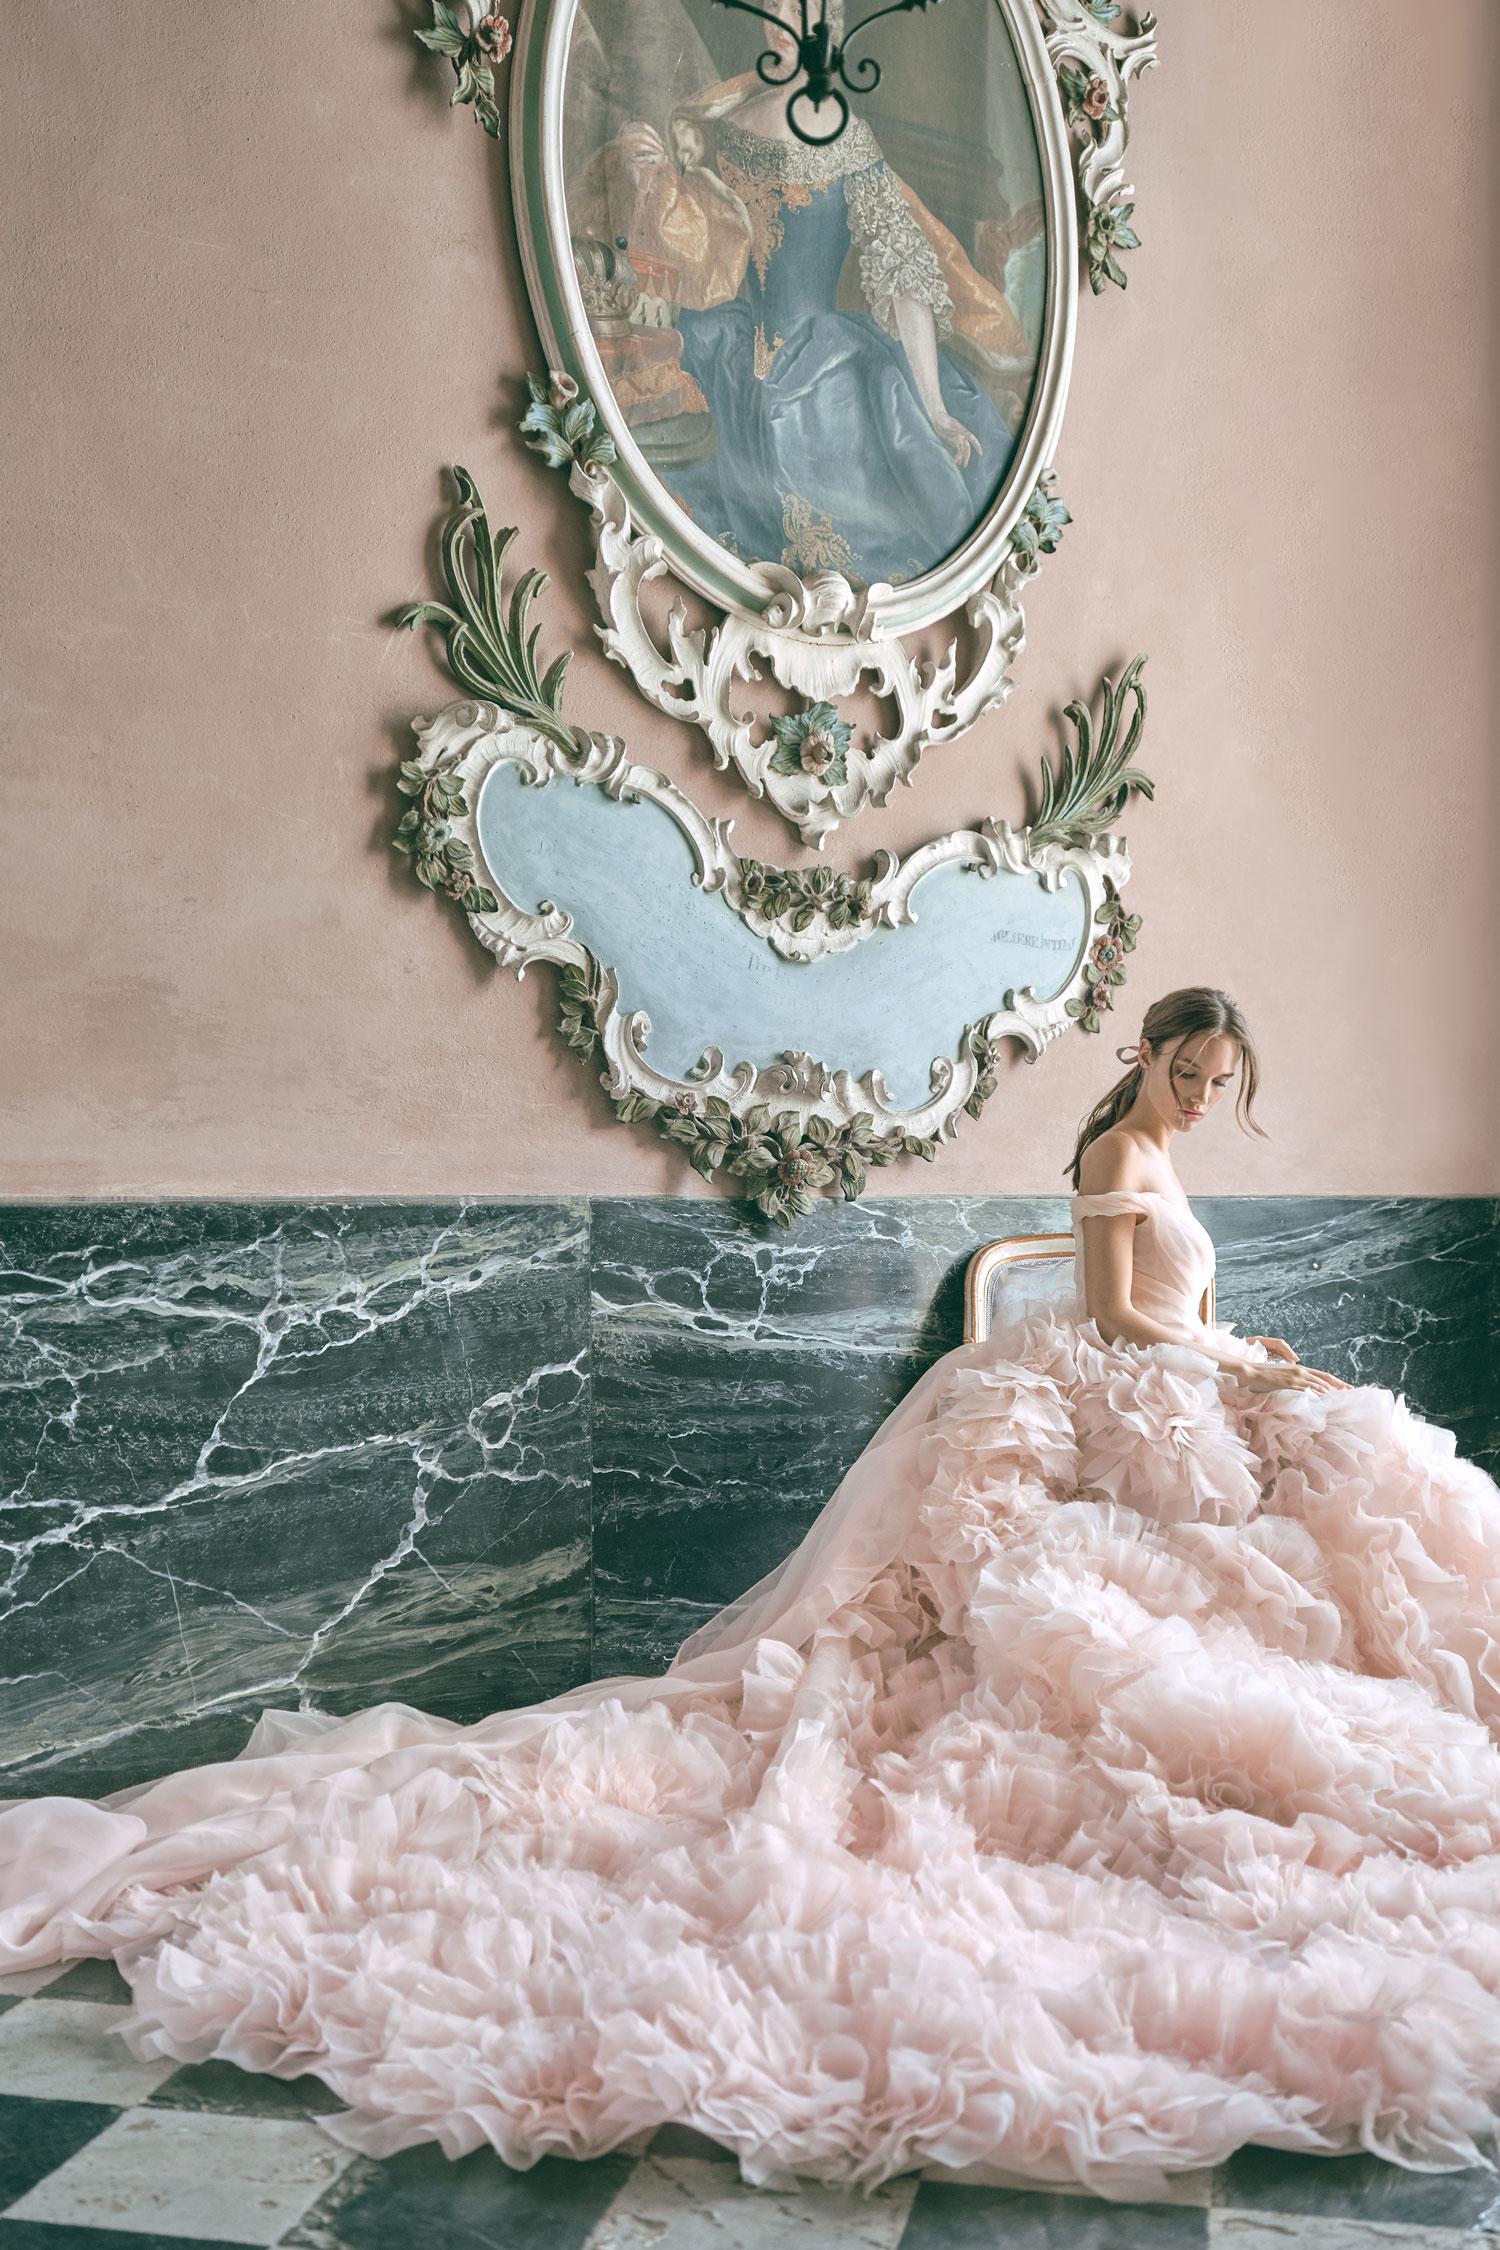 Monique Lhuillier secret garden fall 2020 bridal collection wedding dress from carine's bridal atelier